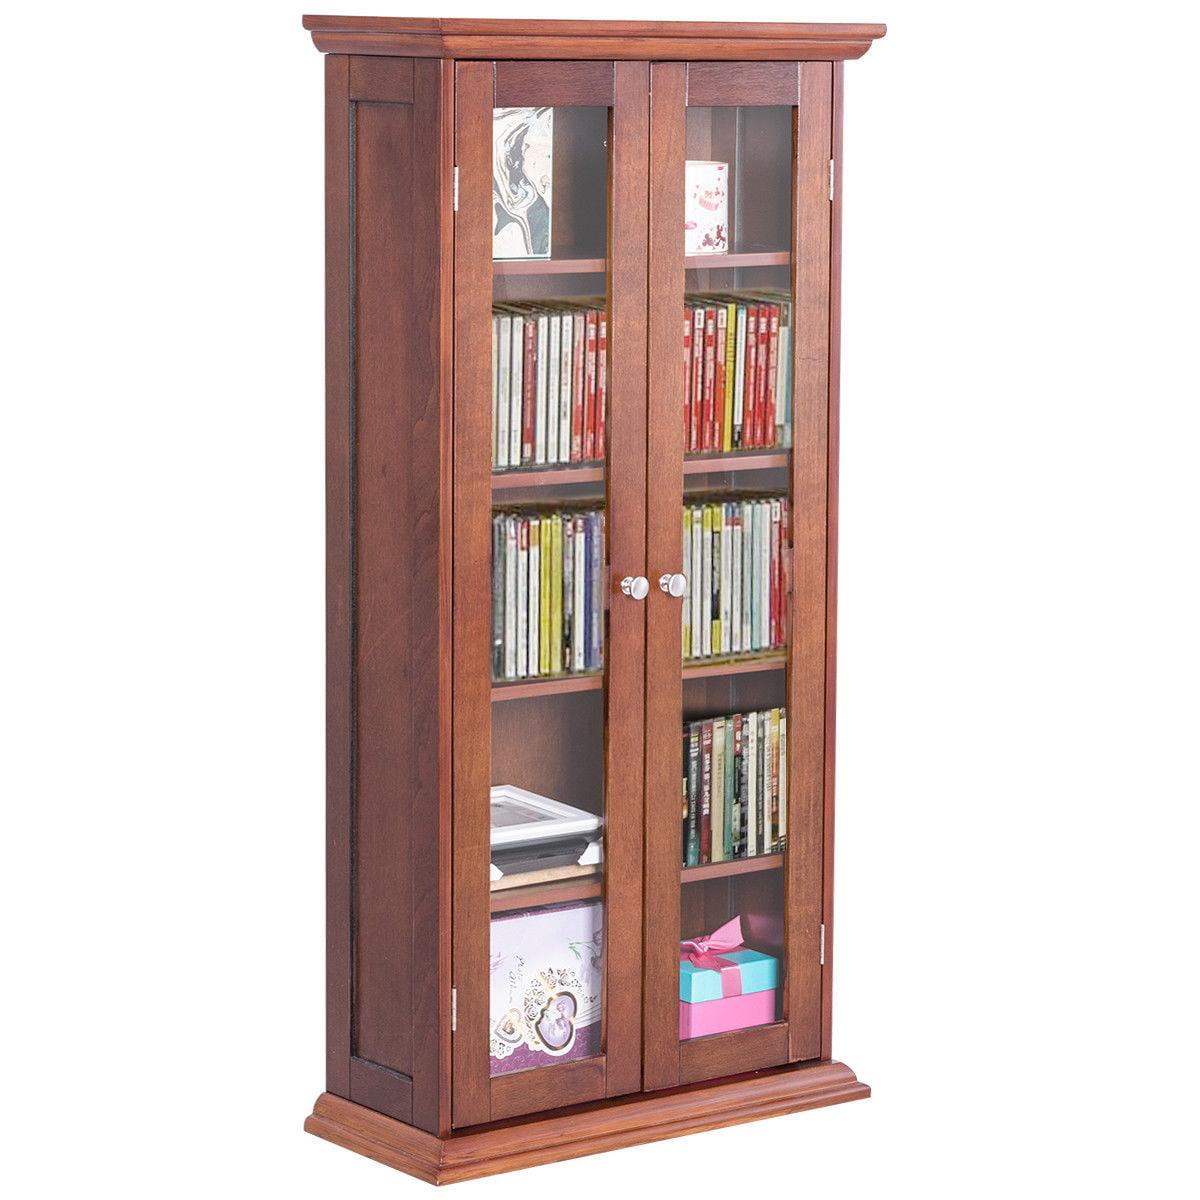 44 5 wood media storage cabinet cd dvd shelves tower glass doors walnut